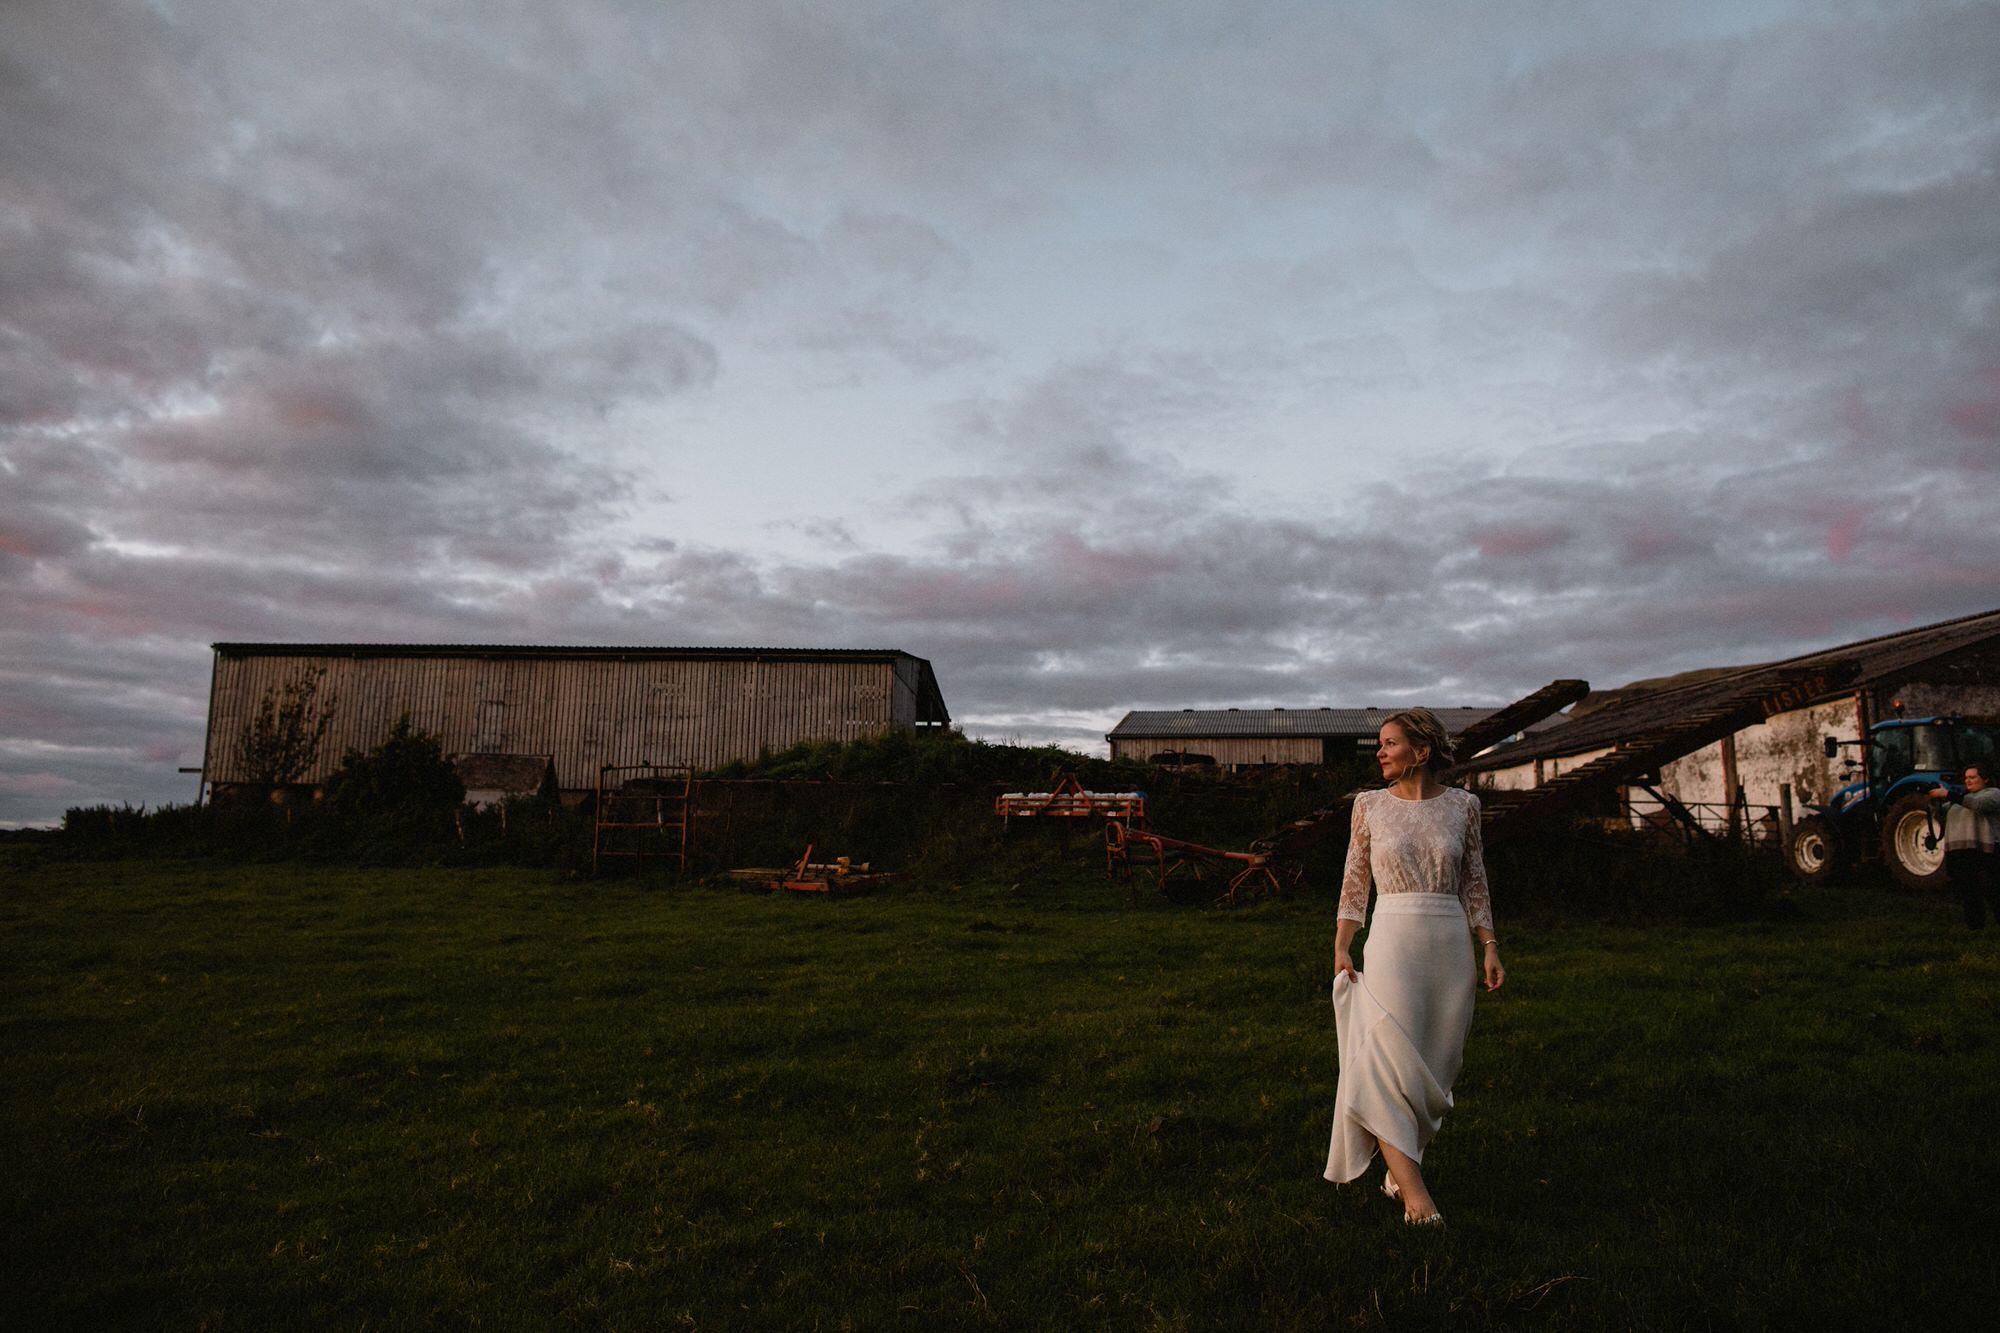 070 TIN SHED KNOCKRAICH WEDDING AUTUMN ZOE ALEXANDRA PHOTOGRAPHY